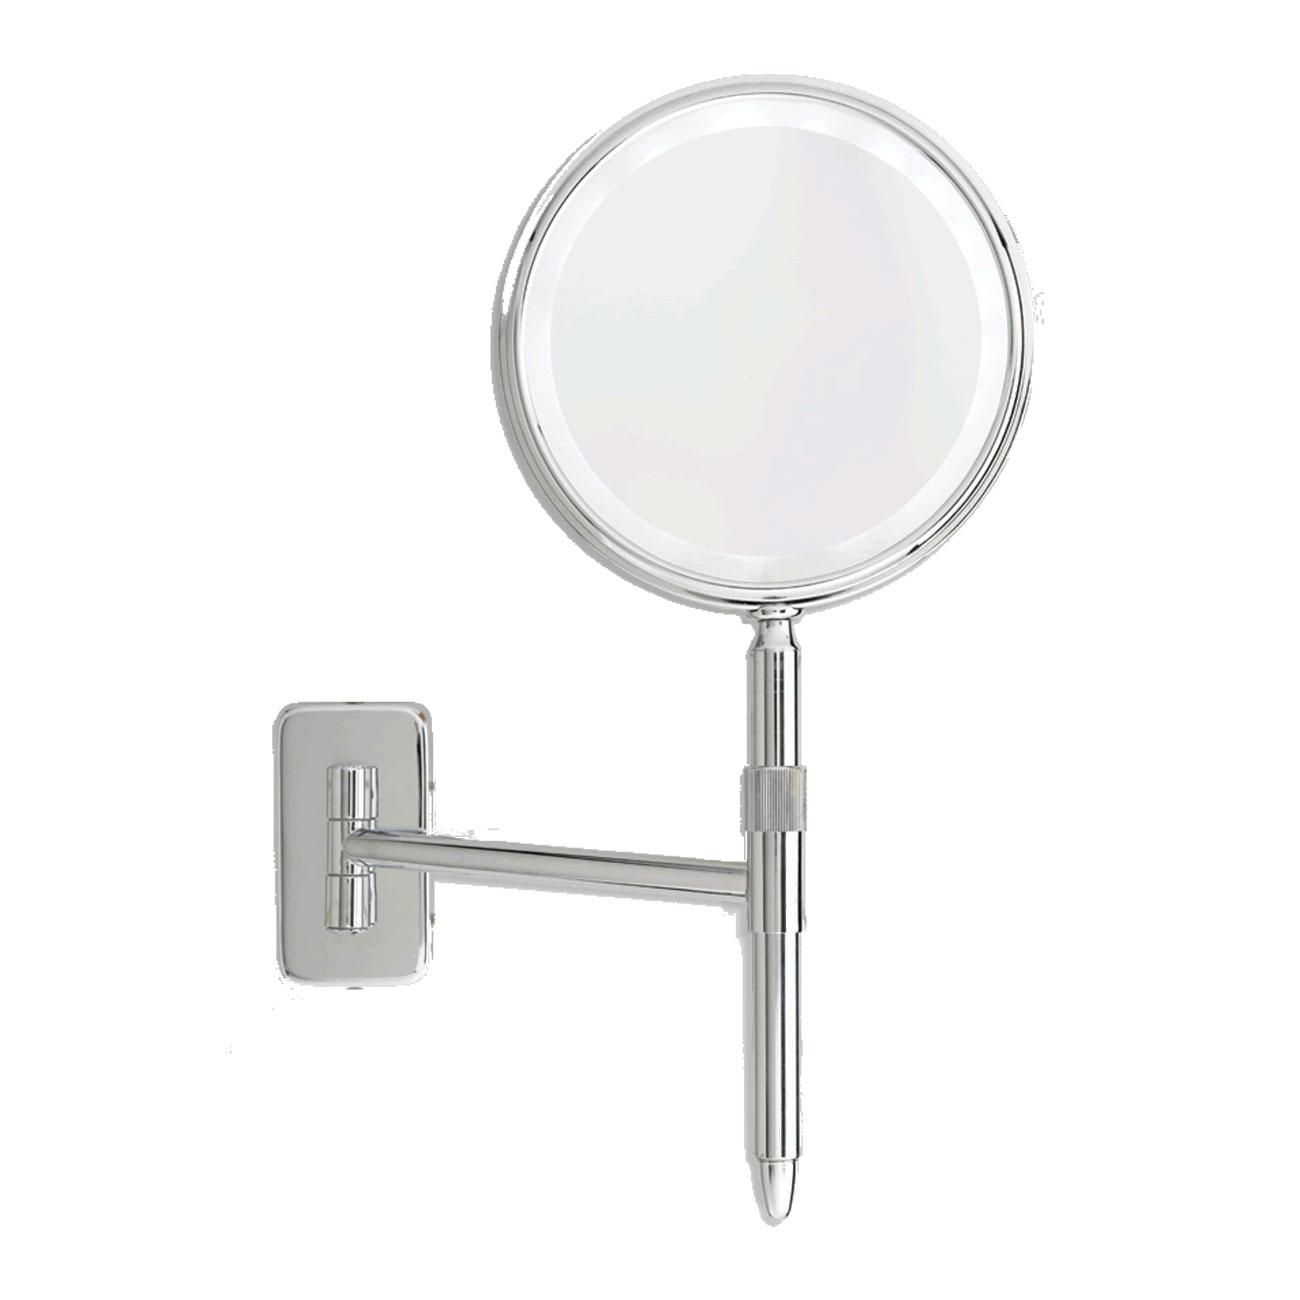 Danielle Wall Mount Hand Held Mirror LED 5X-E